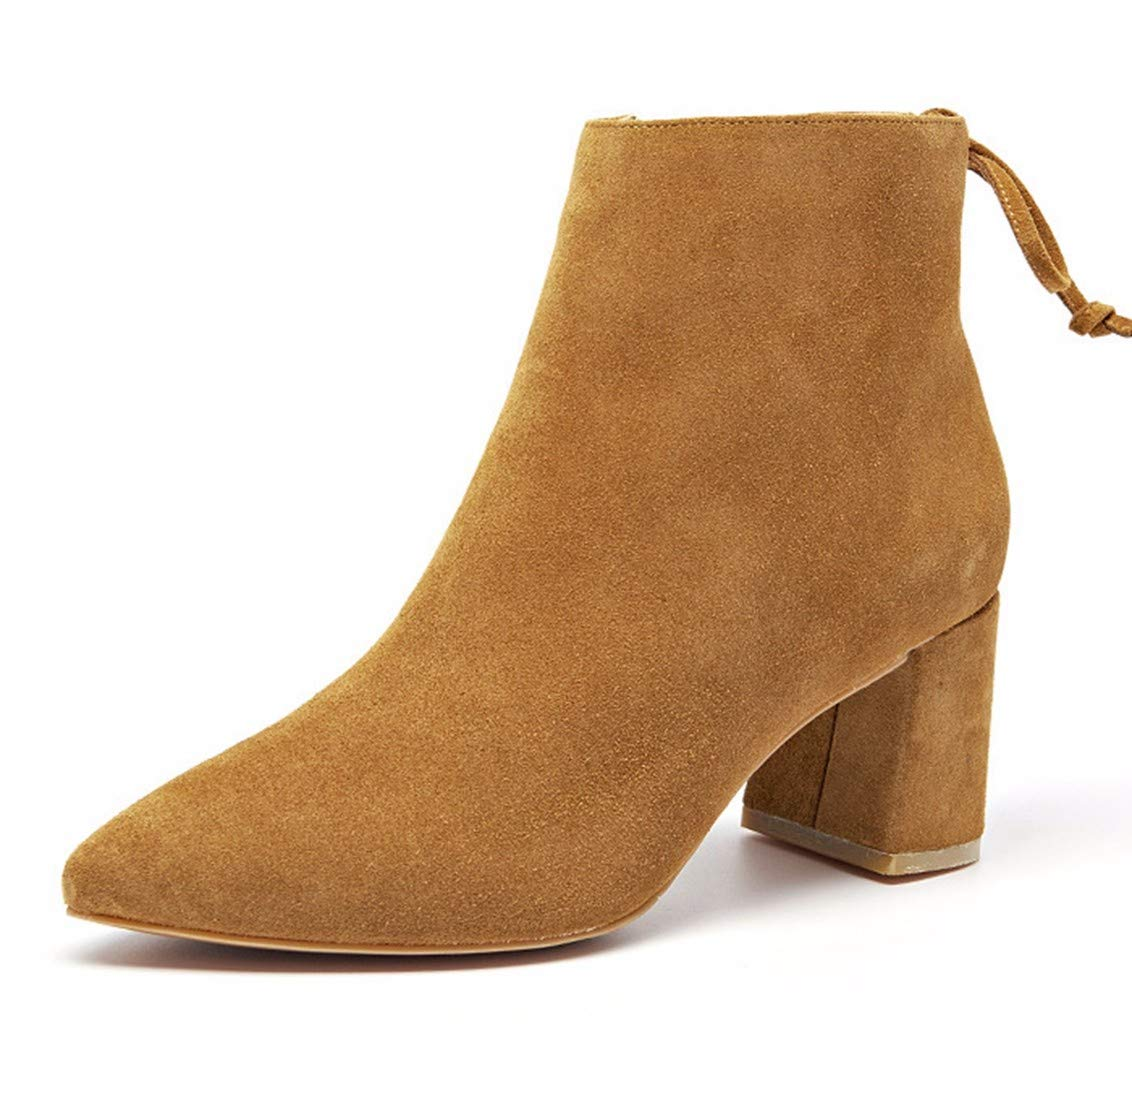 BeatinToes Damen Winter Warm Anti Slip Wasserdicht Leder Schuhe Mit Hohen Absätzen Reine Farbe Casual Schuhe Stiefel Heel Kurzschluss